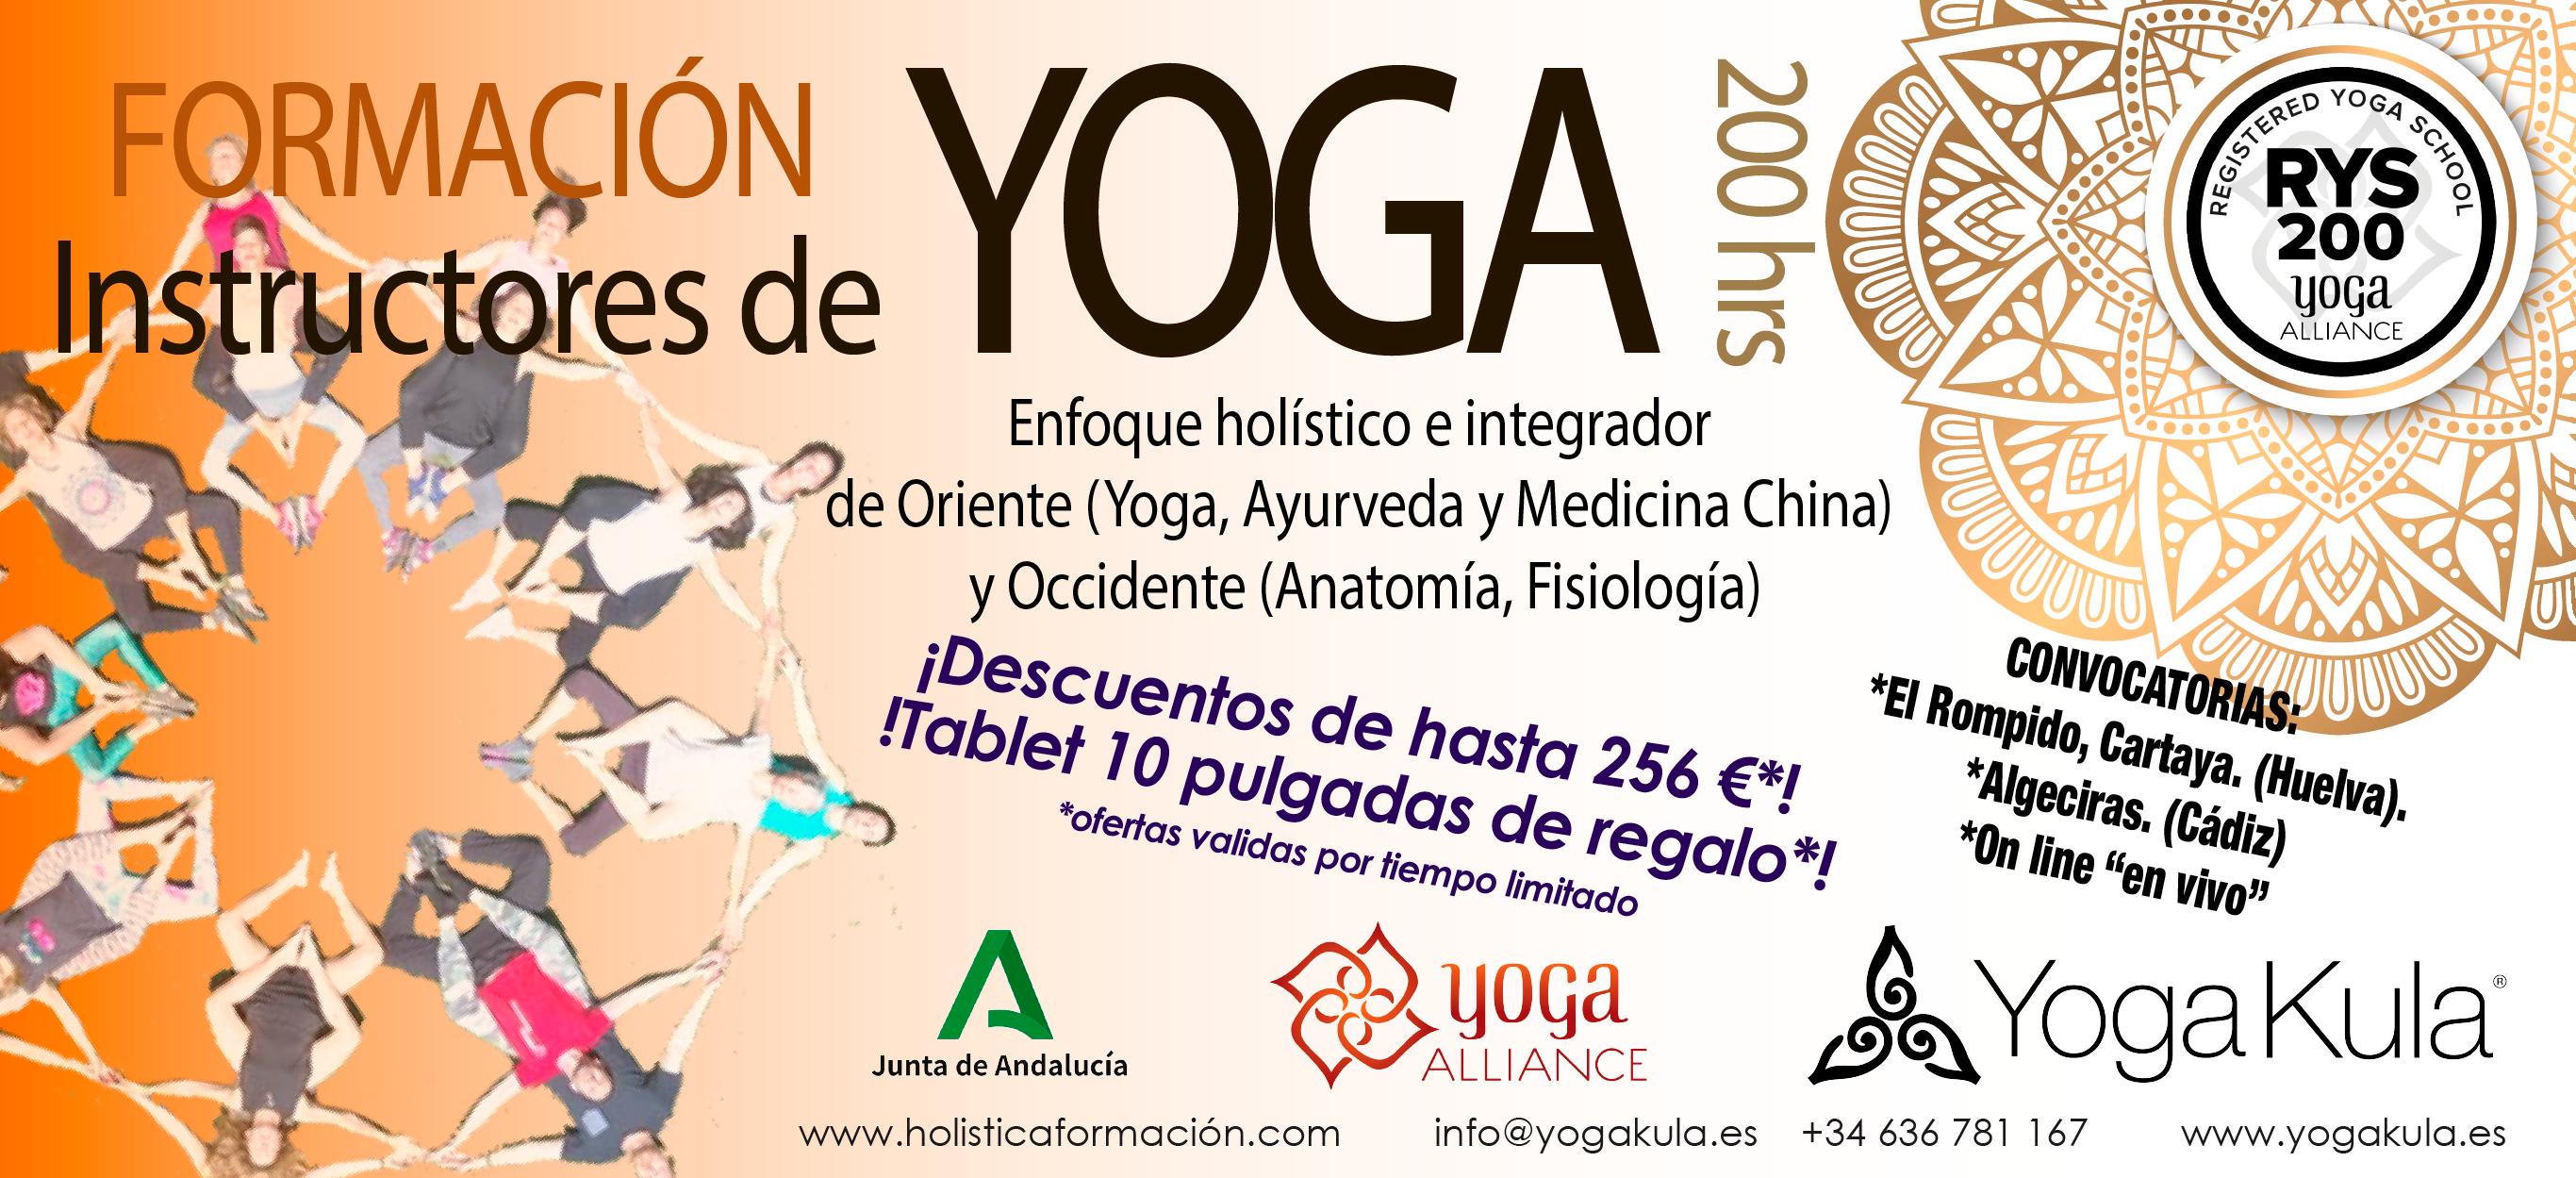 Formación Yoga Kula 200 hrs 20-21